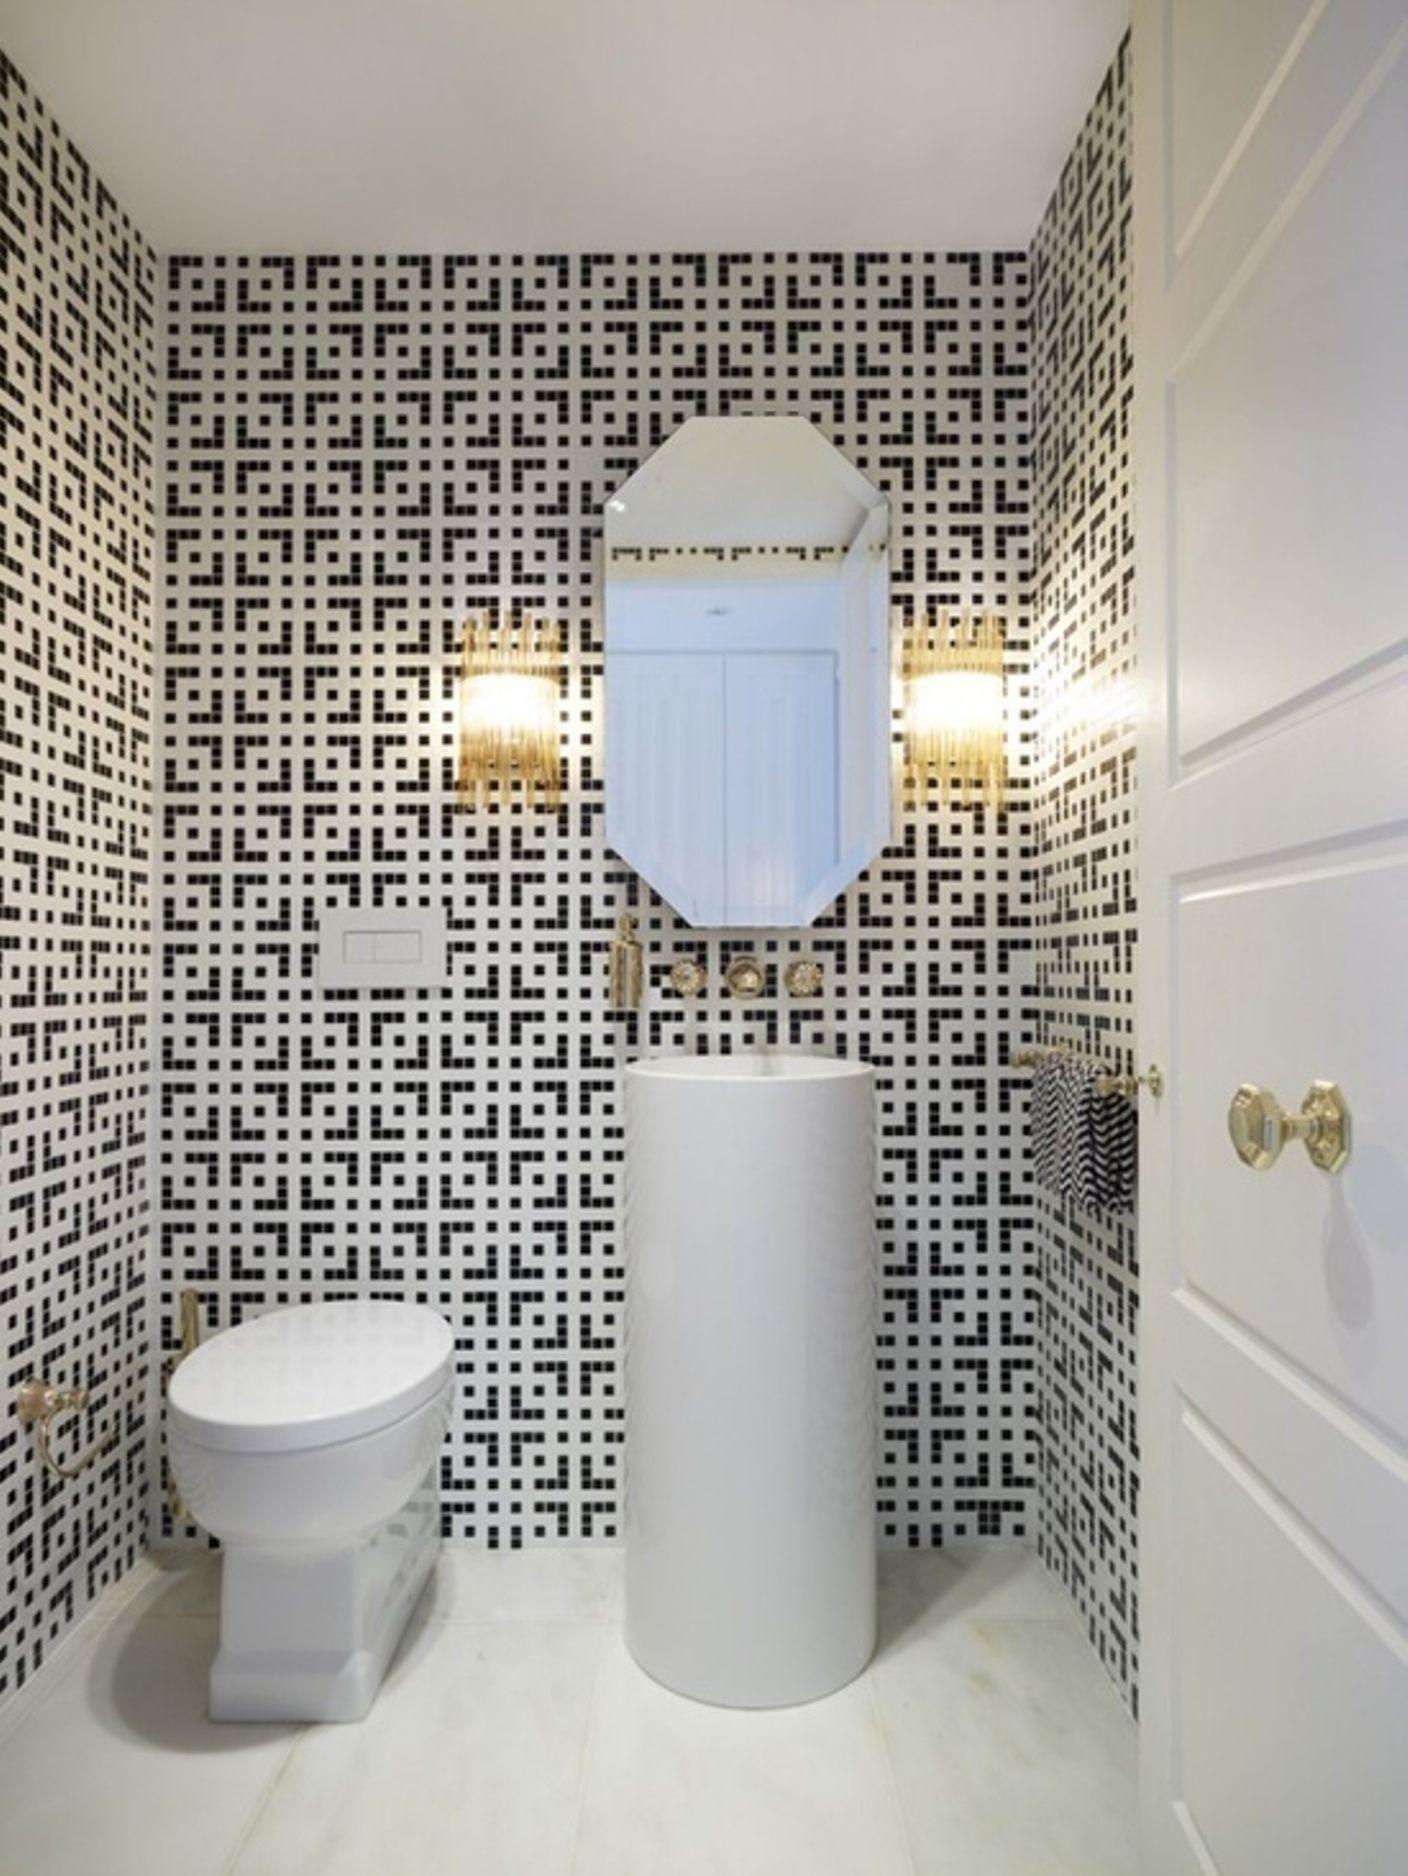 Bathroom tile pattern ideas. | Wish List: House | Pinterest | Tile ...